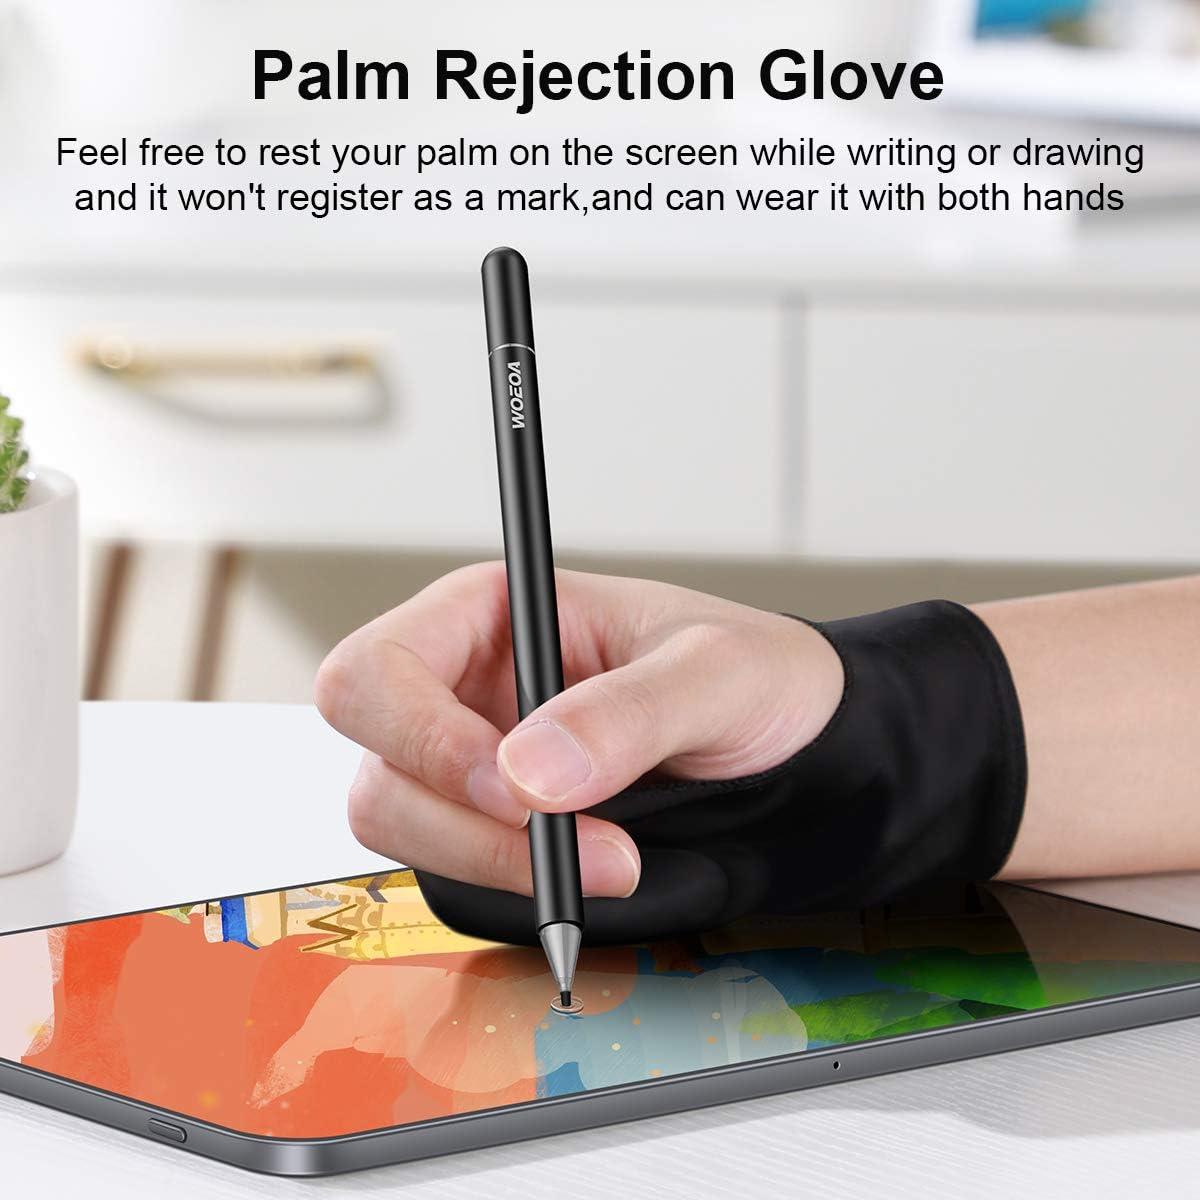 L/ápiz Stylus Capacitivo Universal,WOEOA Stylus Pen con Dibujo Guante,Bol/ígrafos Digitales para Pantalla T/áctil Ipads,iPad Mini//iPad Air//iPad Pro,Samsung,Tel/éfonos m/óviles,Smartphones y Tabletas